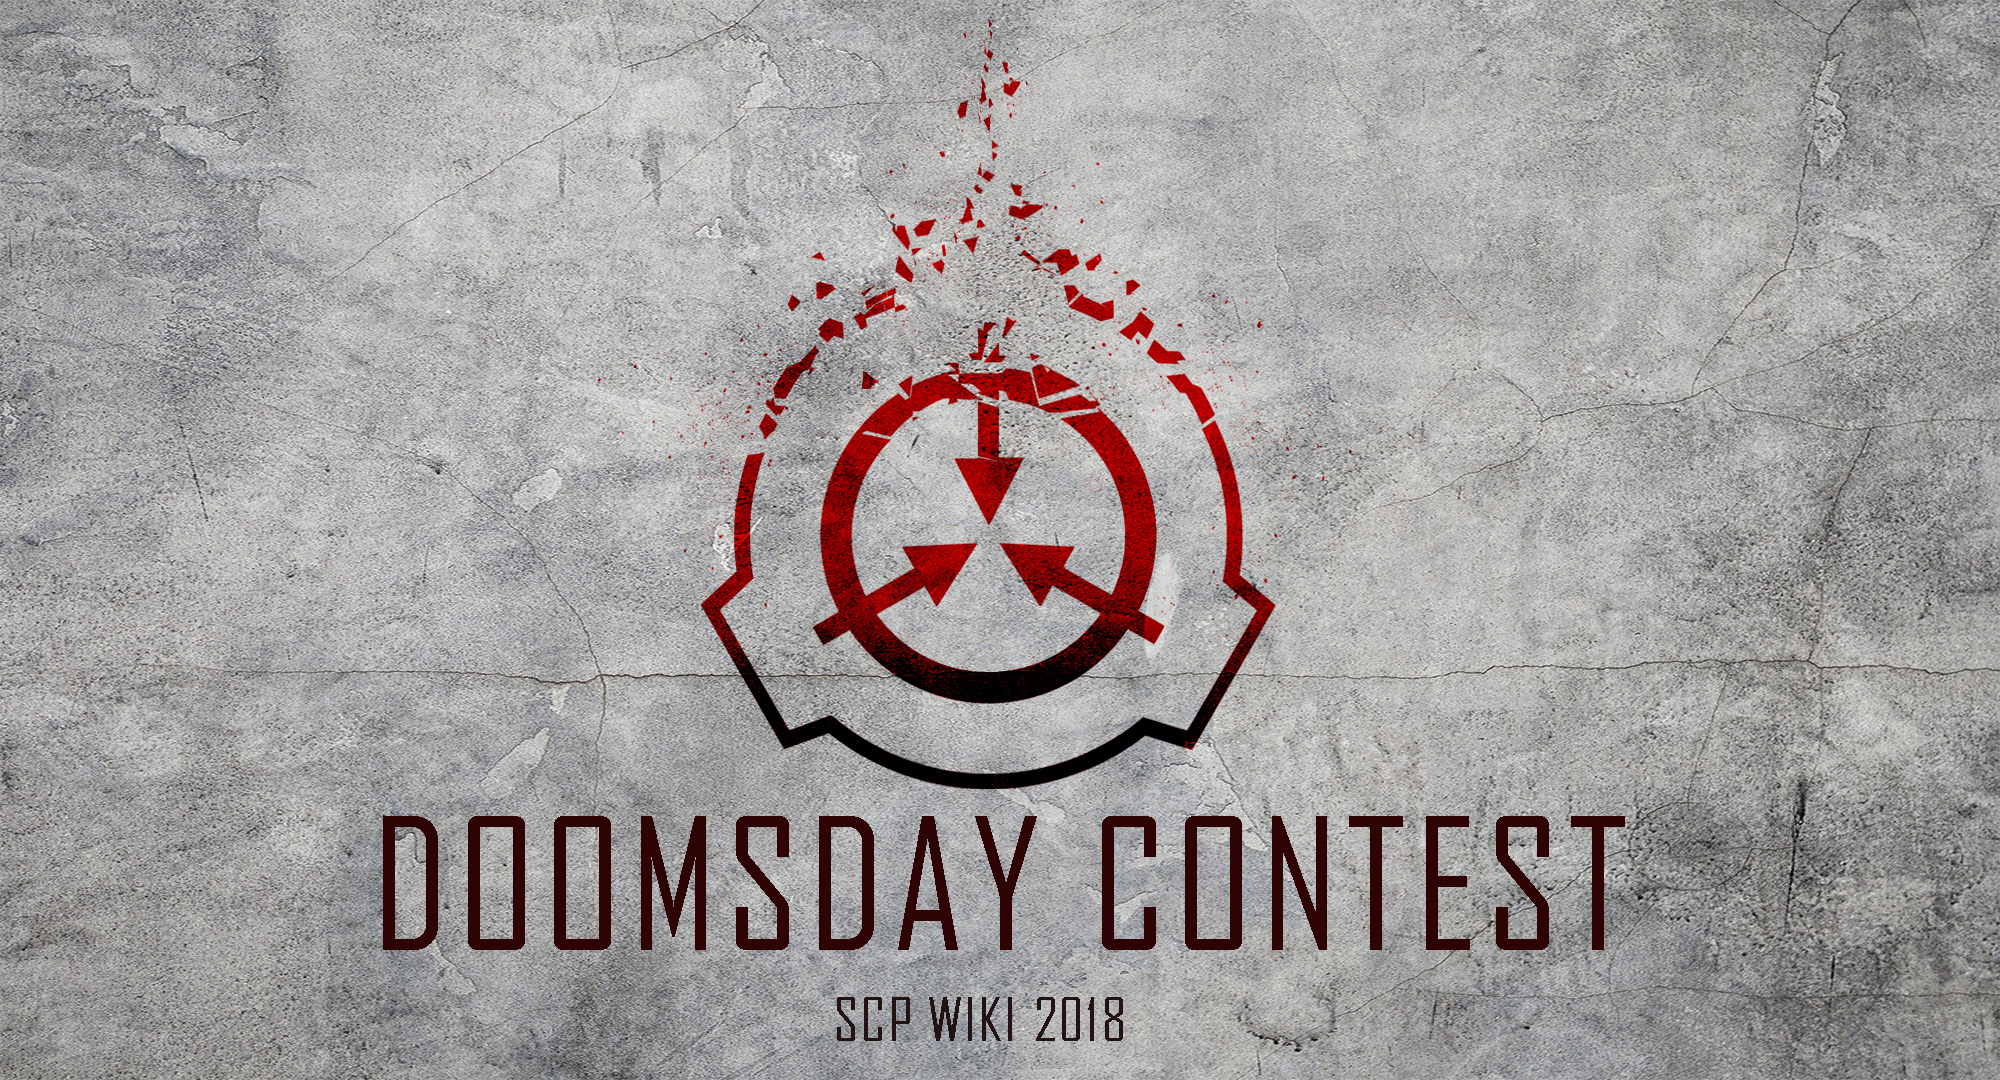 Doomsday_banner_2.jpg